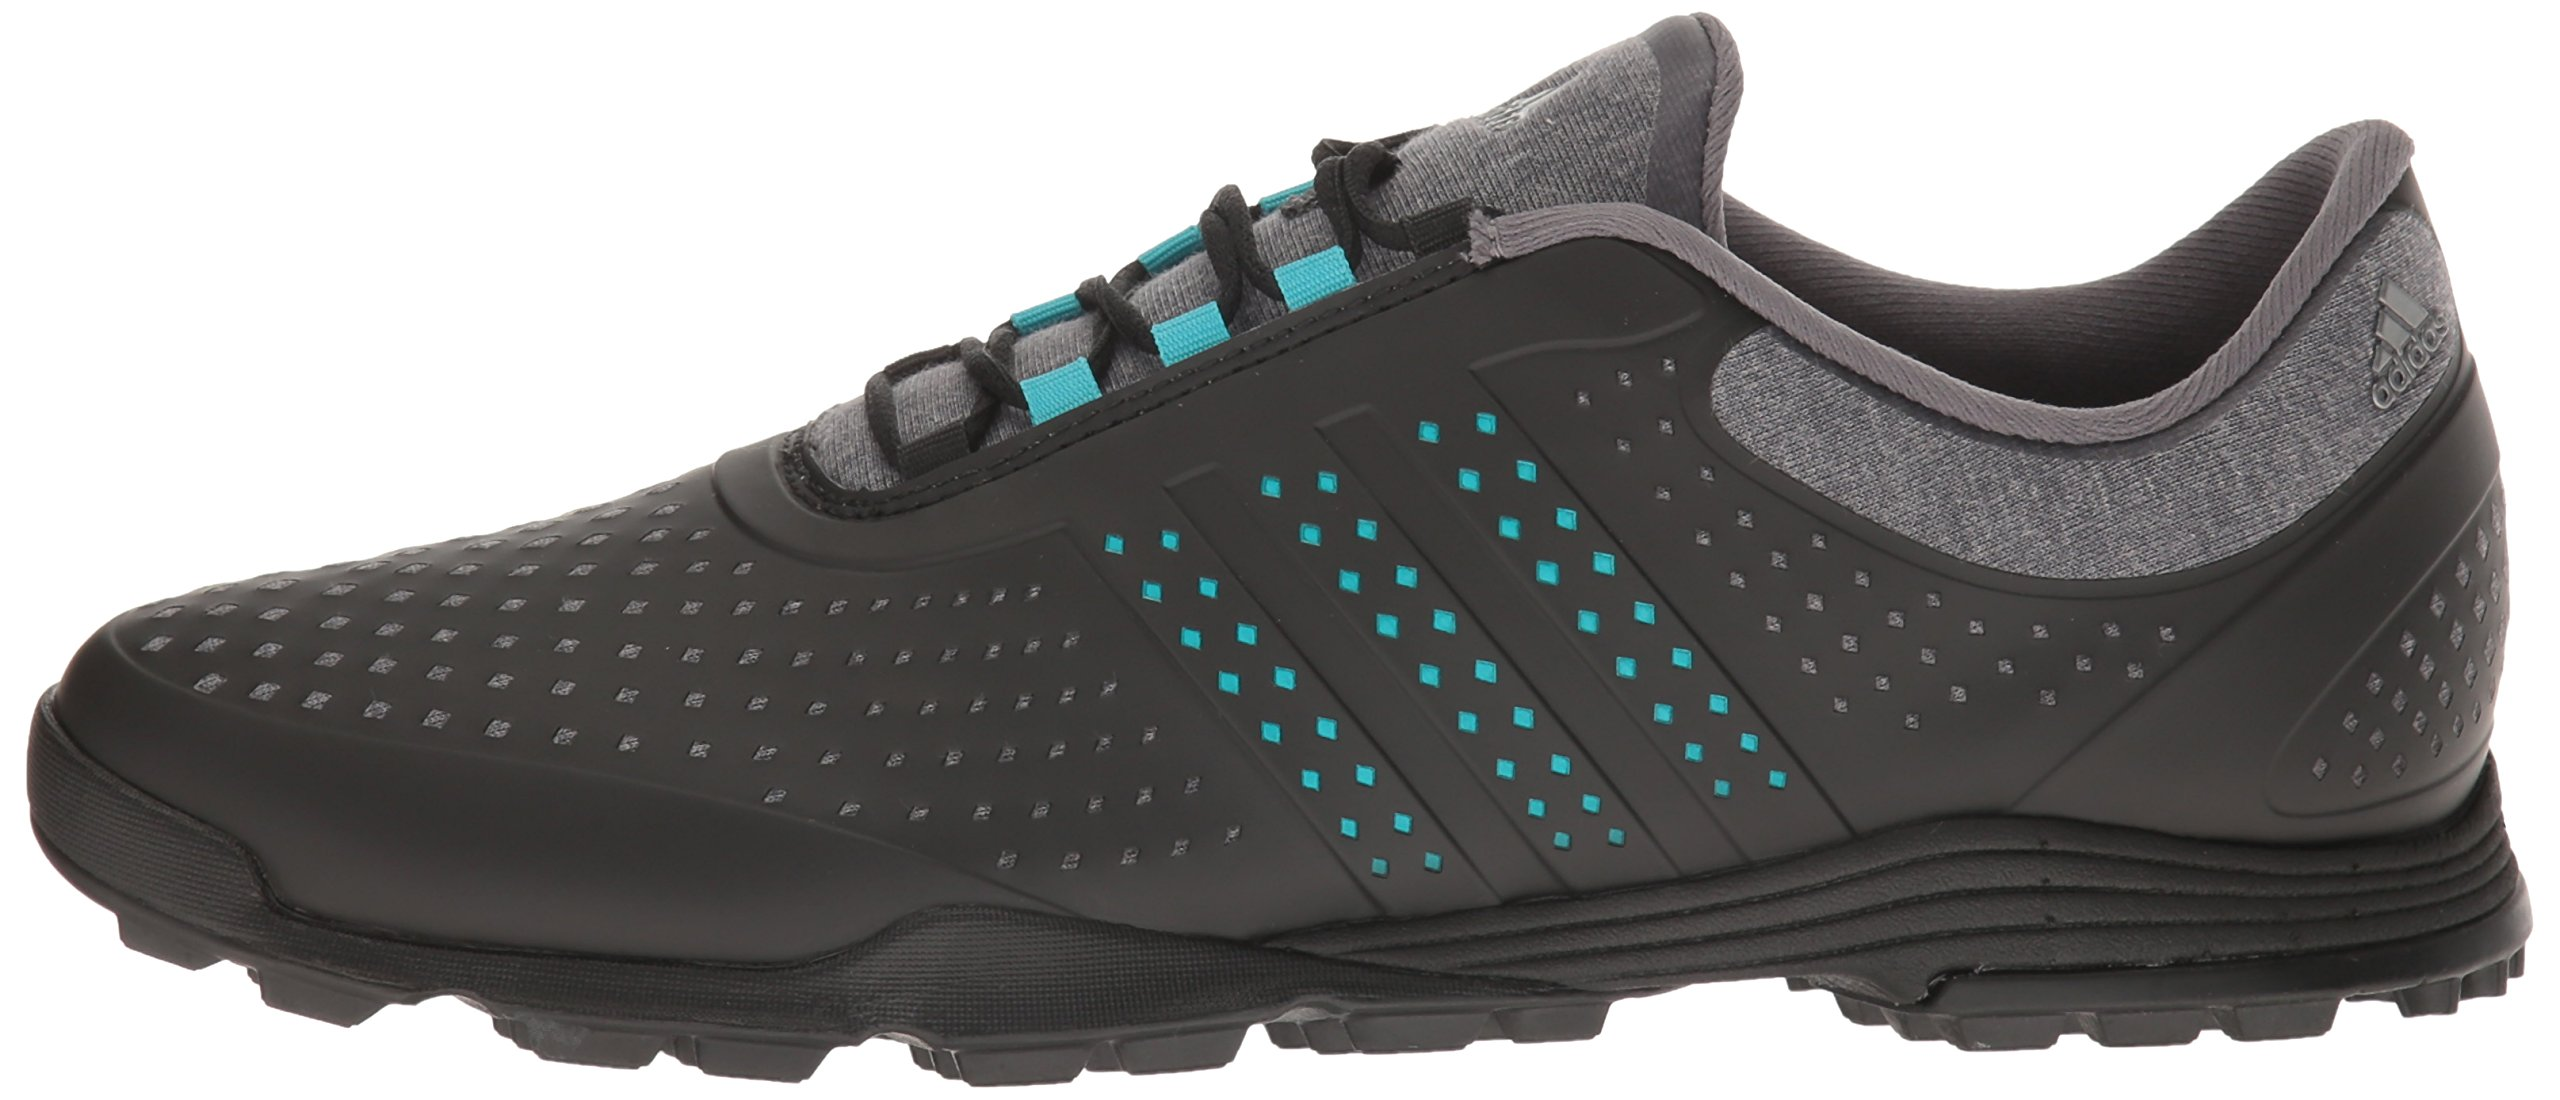 adidas Women's Adipure Sport Golf Shoe, Grey, 7 M US by adidas (Image #5)